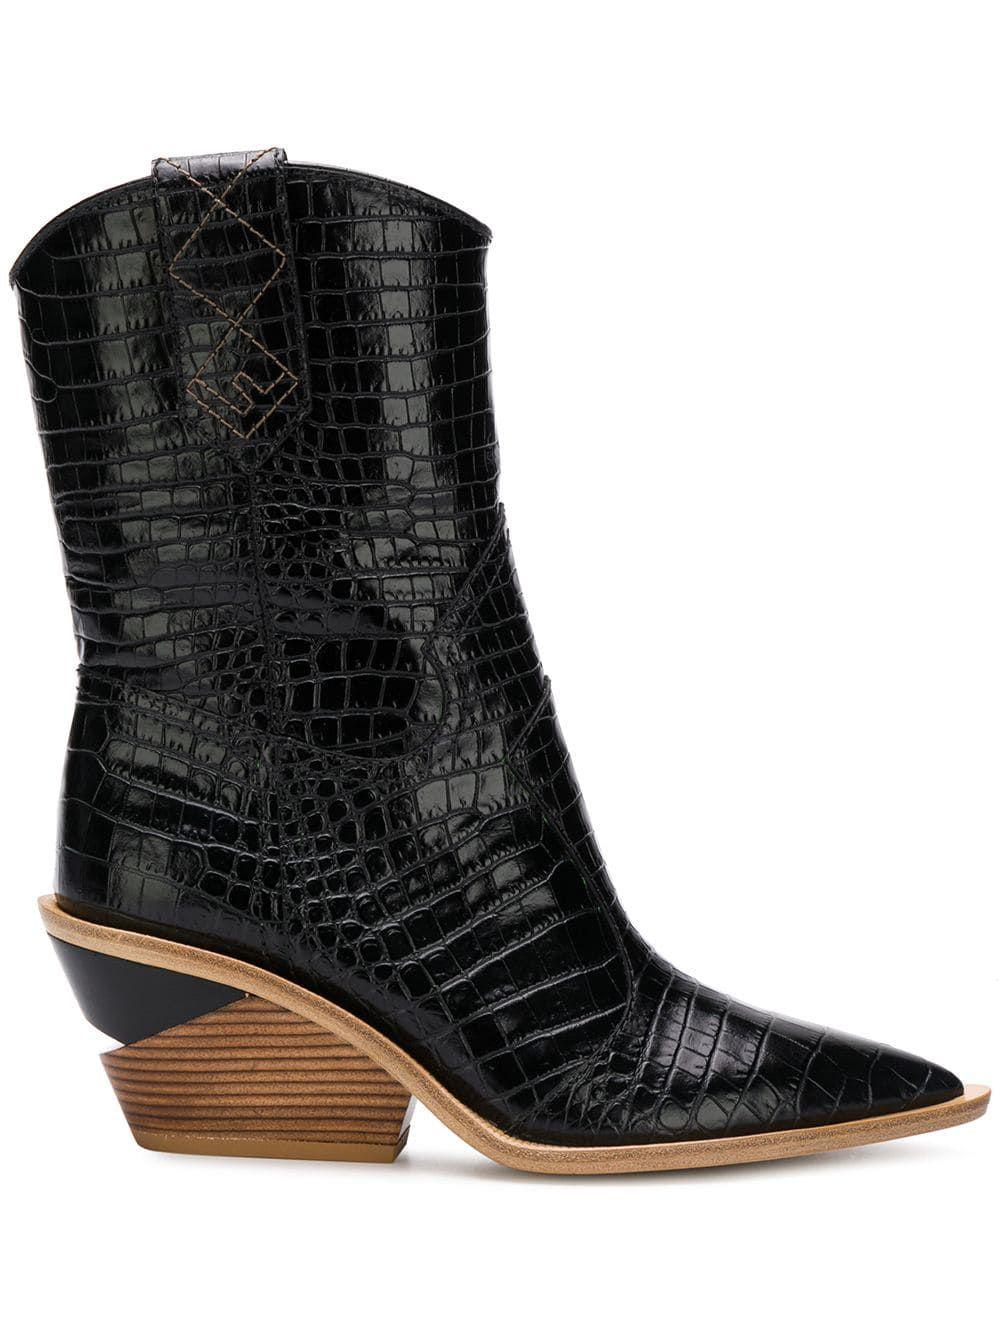 ce493ba1657 Fendi crocodile-embossed ankle boots #highfashion #chic #trending ...